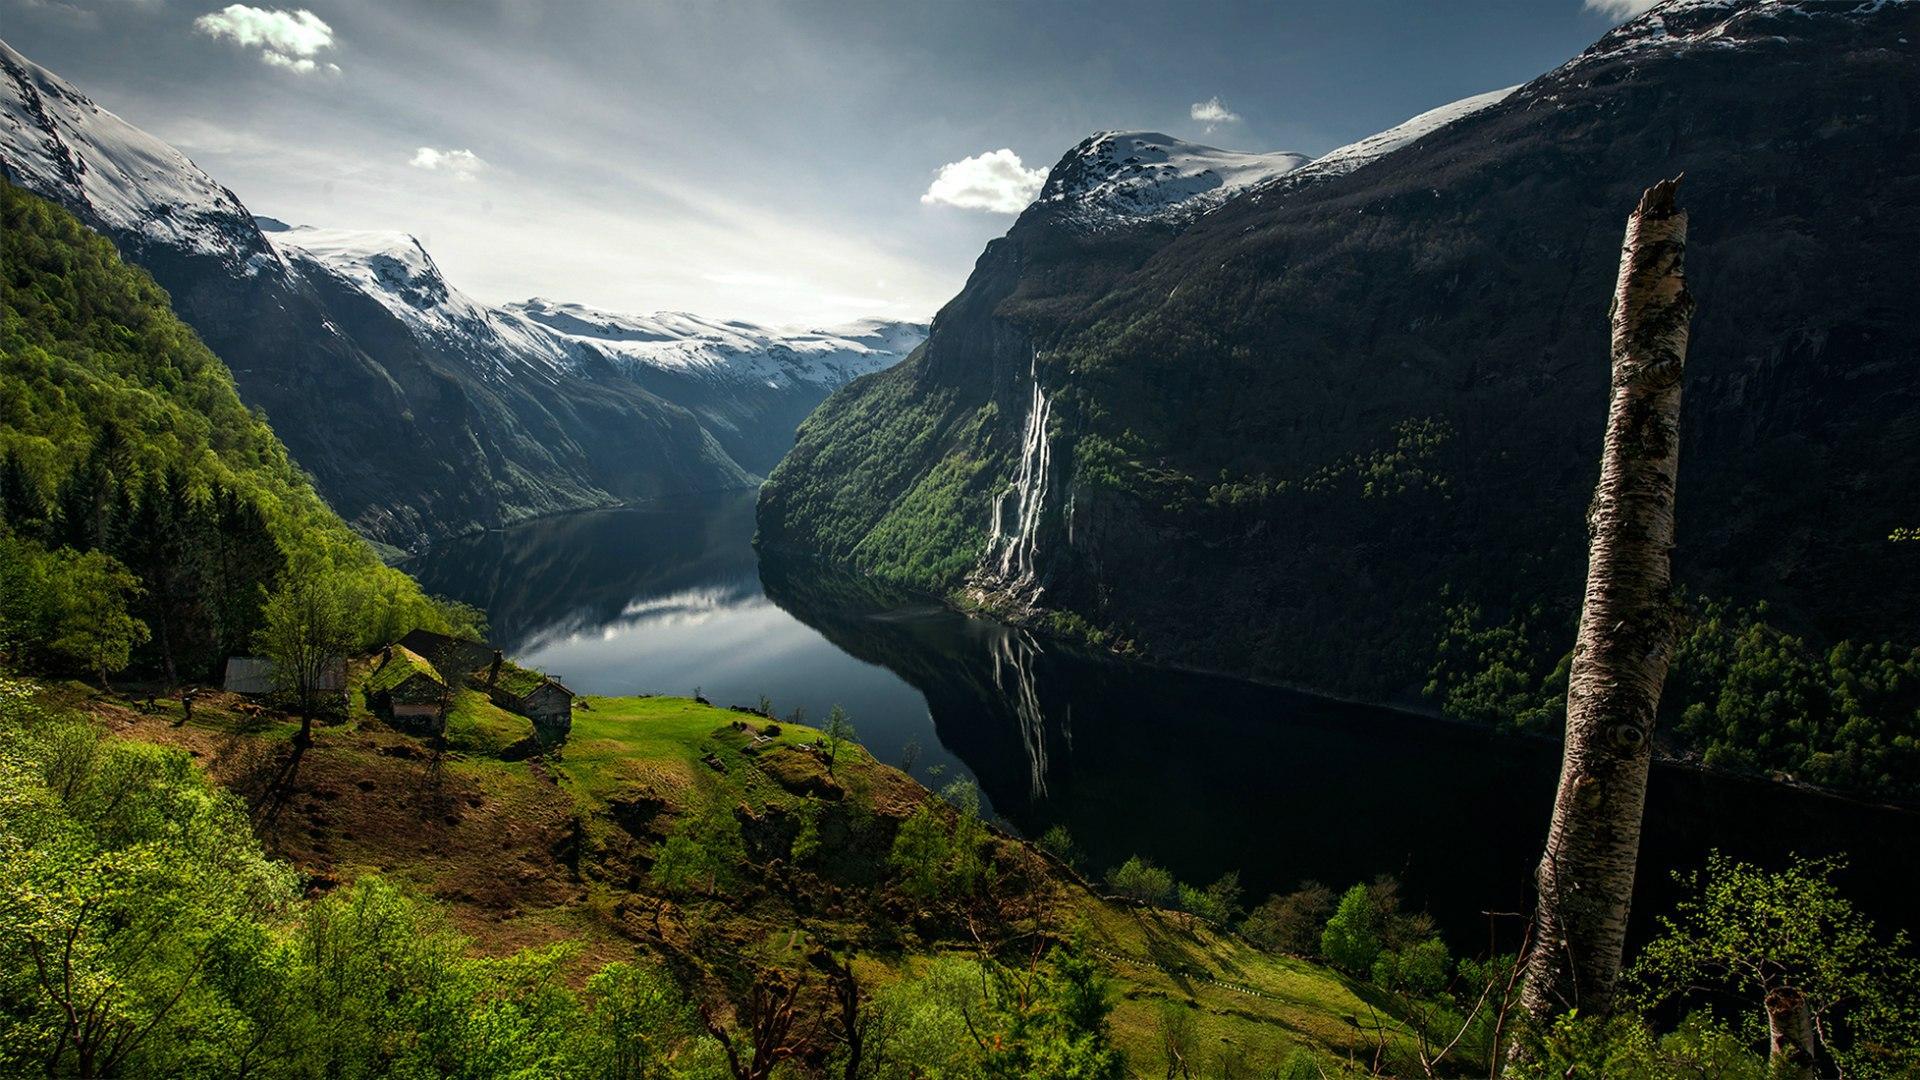 Норвегия 2560x1440  обои на рабочий стол